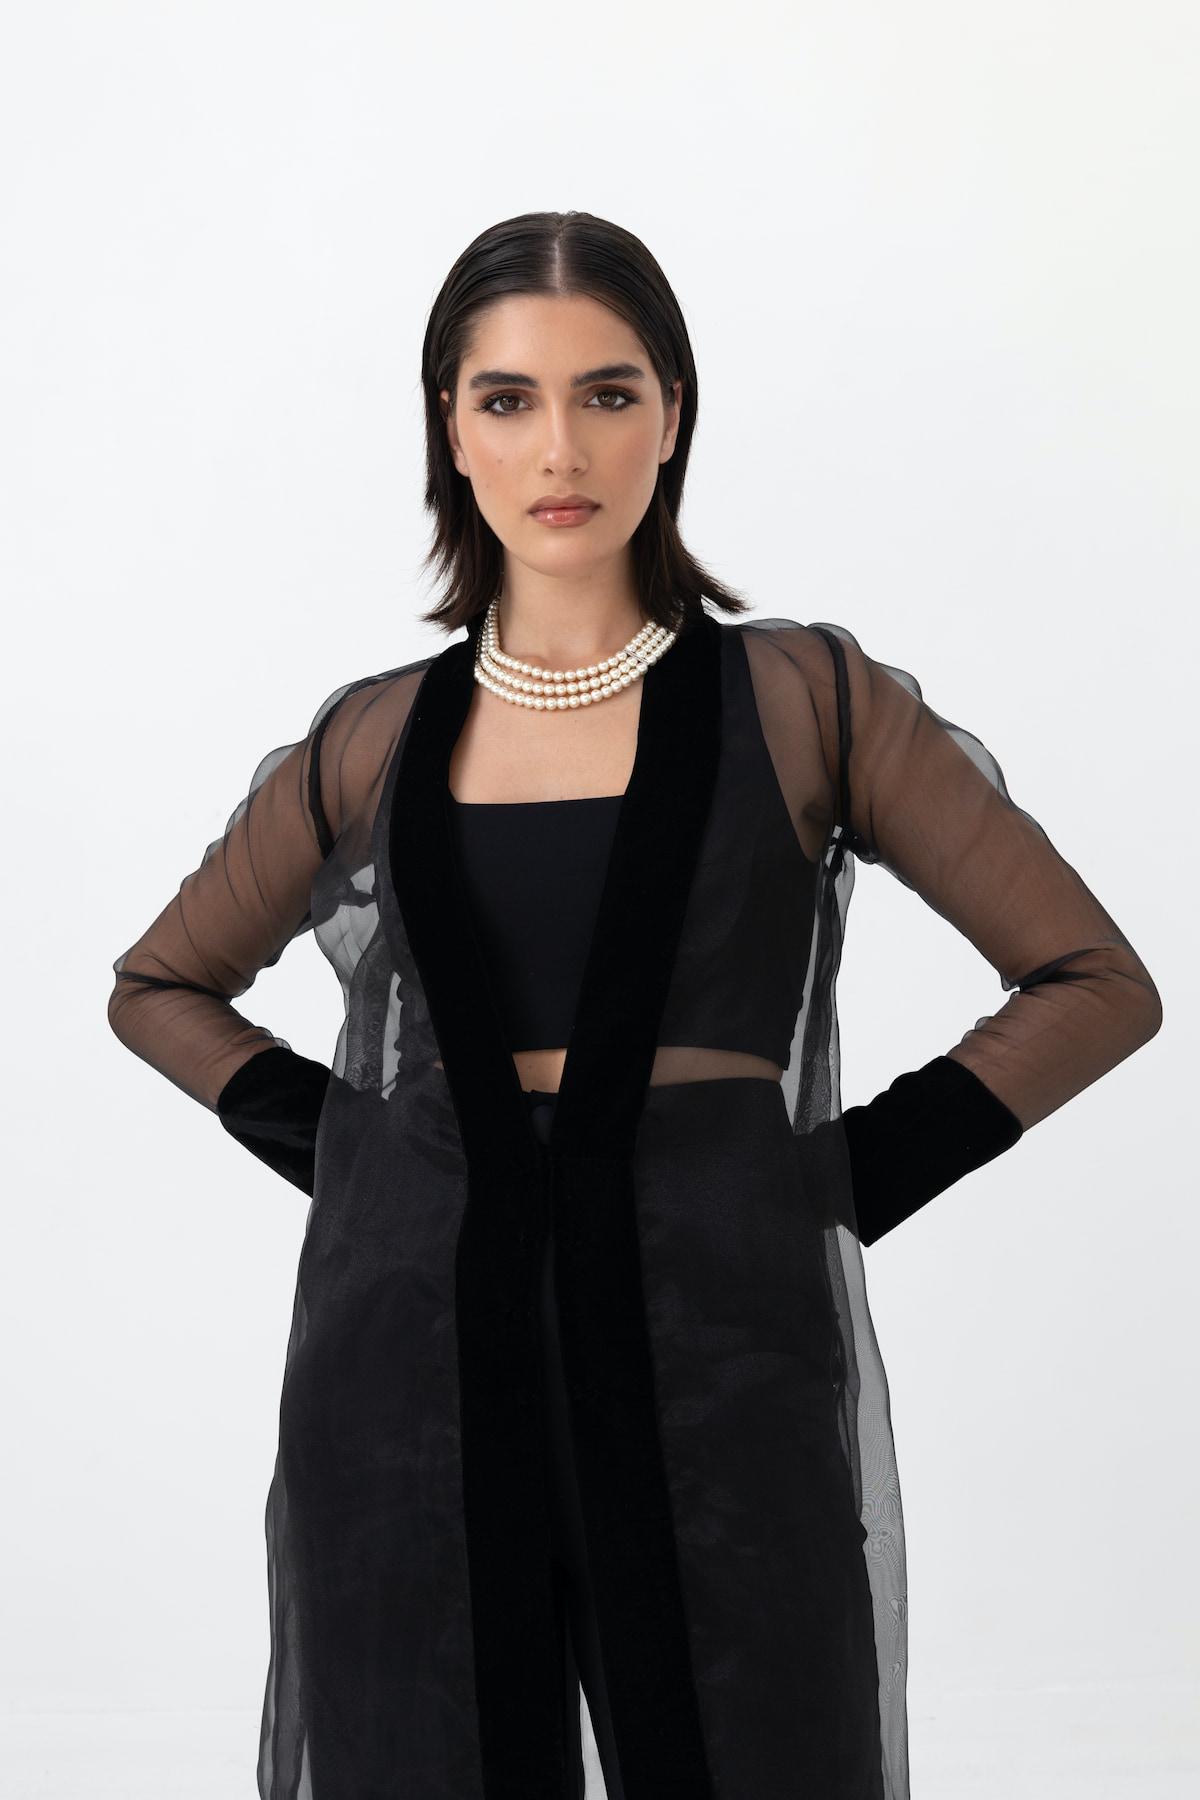 View 5 of model wearing Kiera Kimono in black.